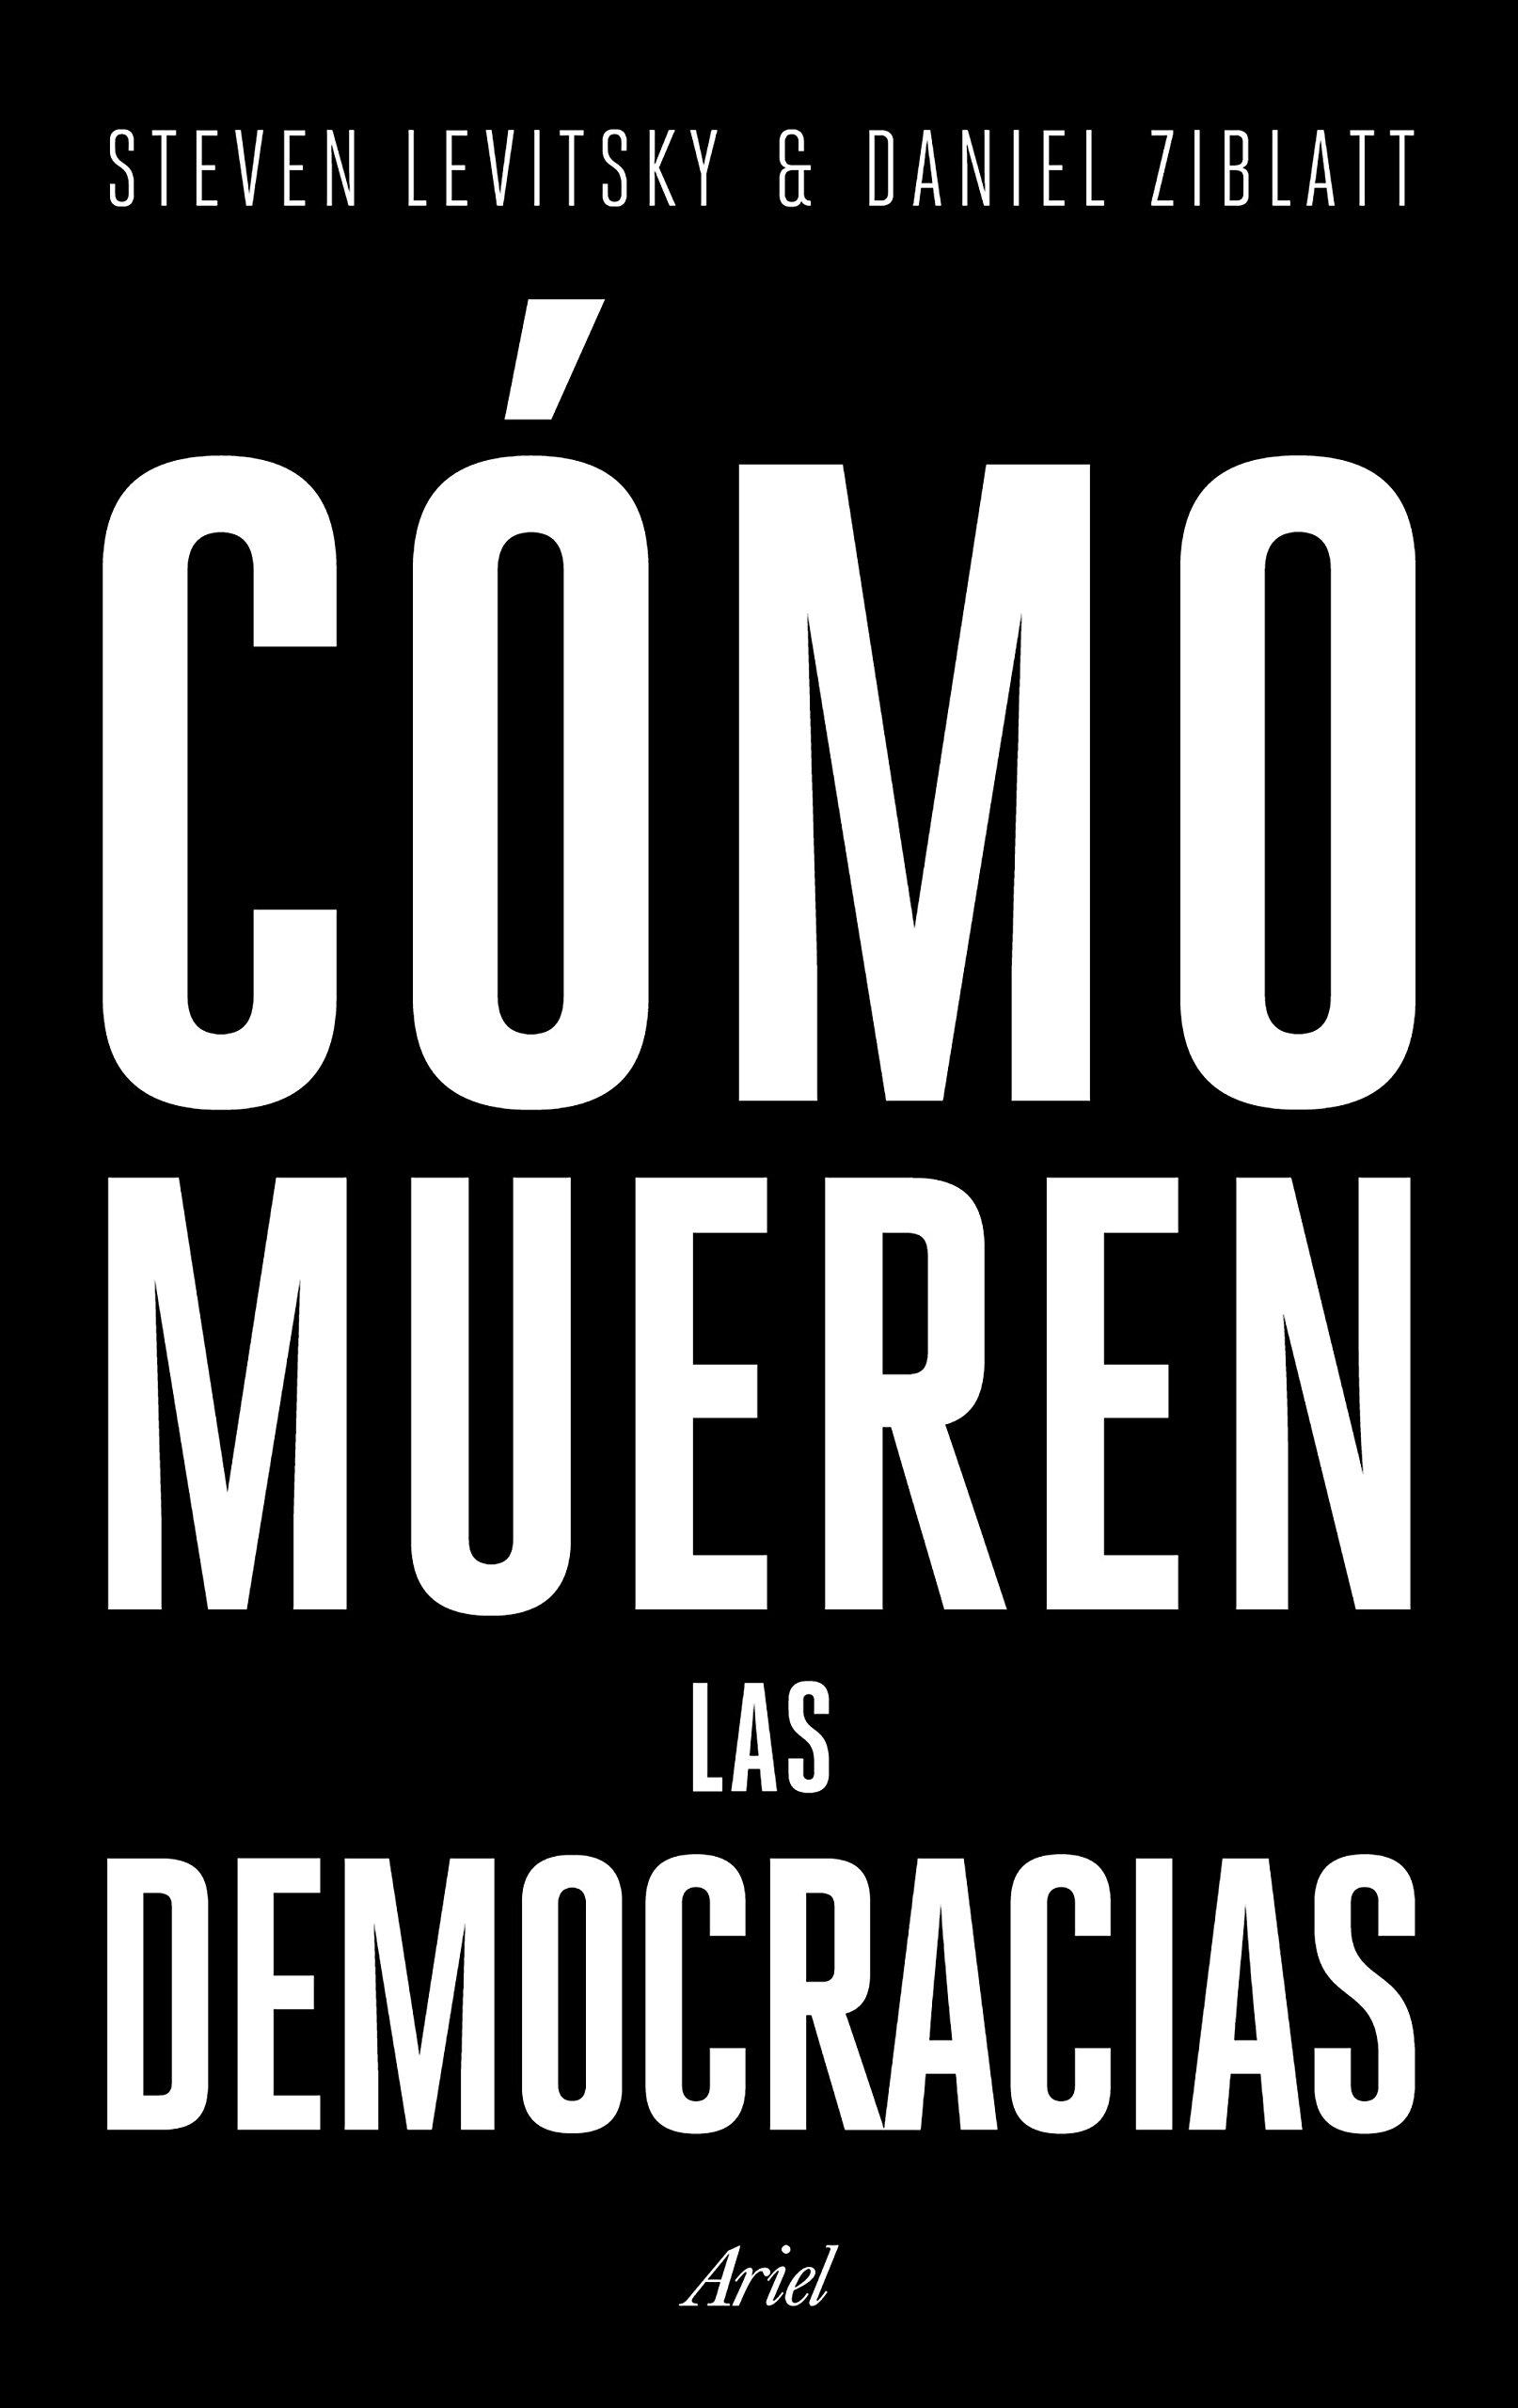 Cómo mueren las democracias (Ariel) Tapa dura – 4 sep 2018 Steven Levitsky Daniel Ziblatt Gemma Deza Guil Editorial Ariel